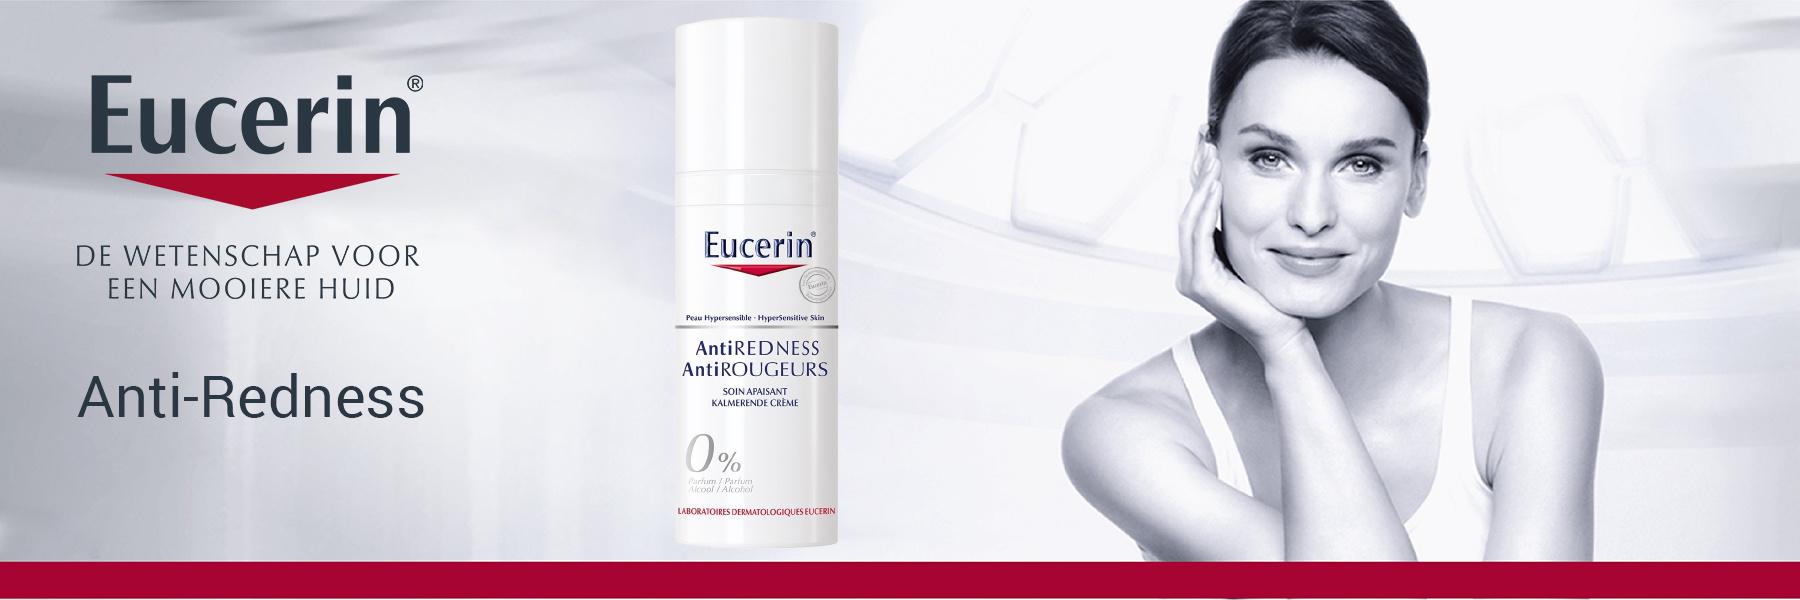 Eucerin Anti-Redness